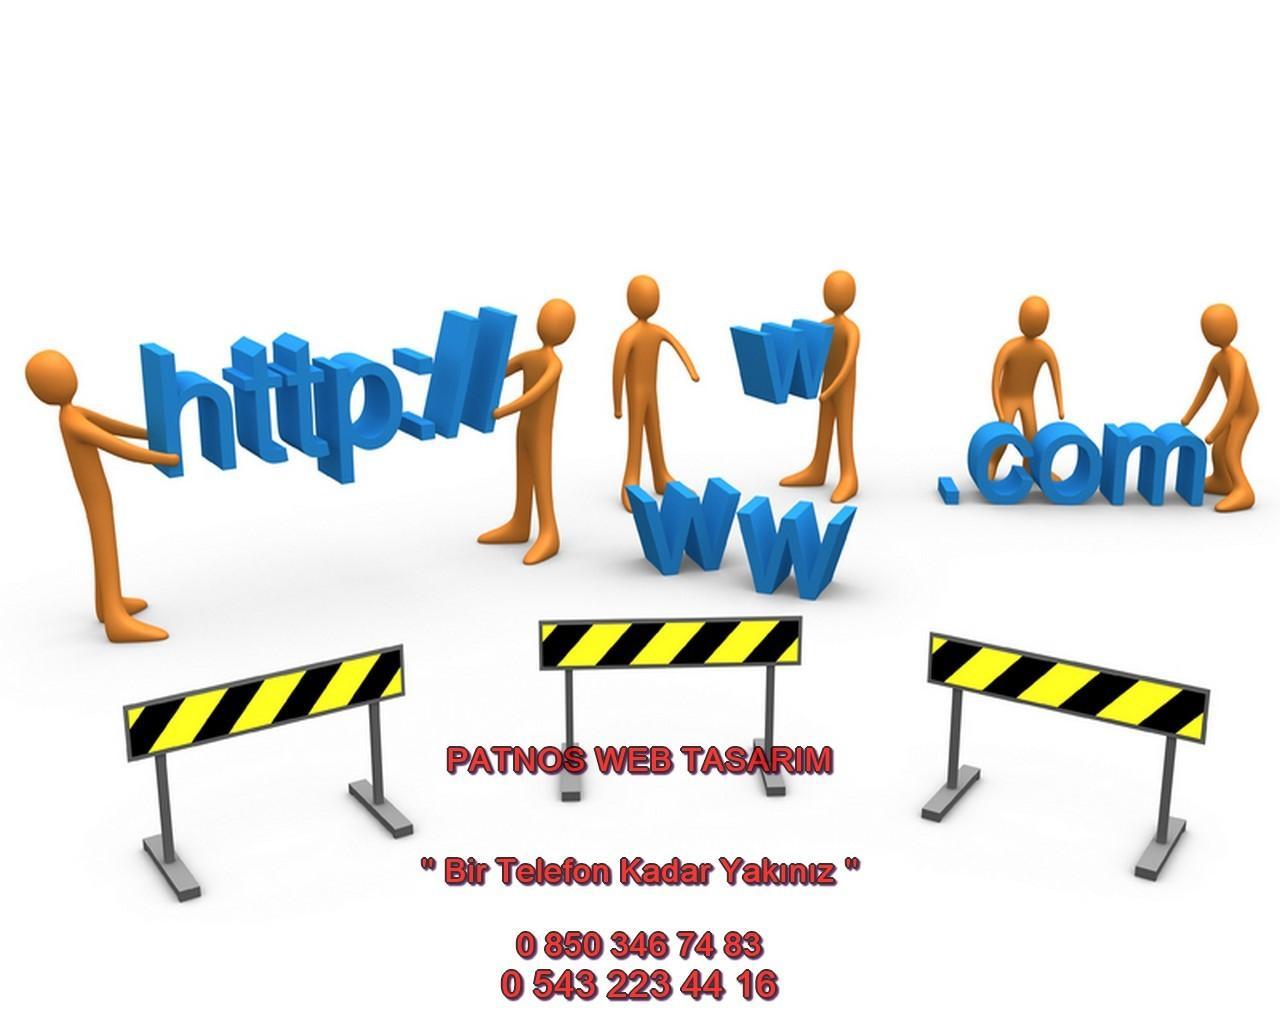 Patnos Web Tasarım